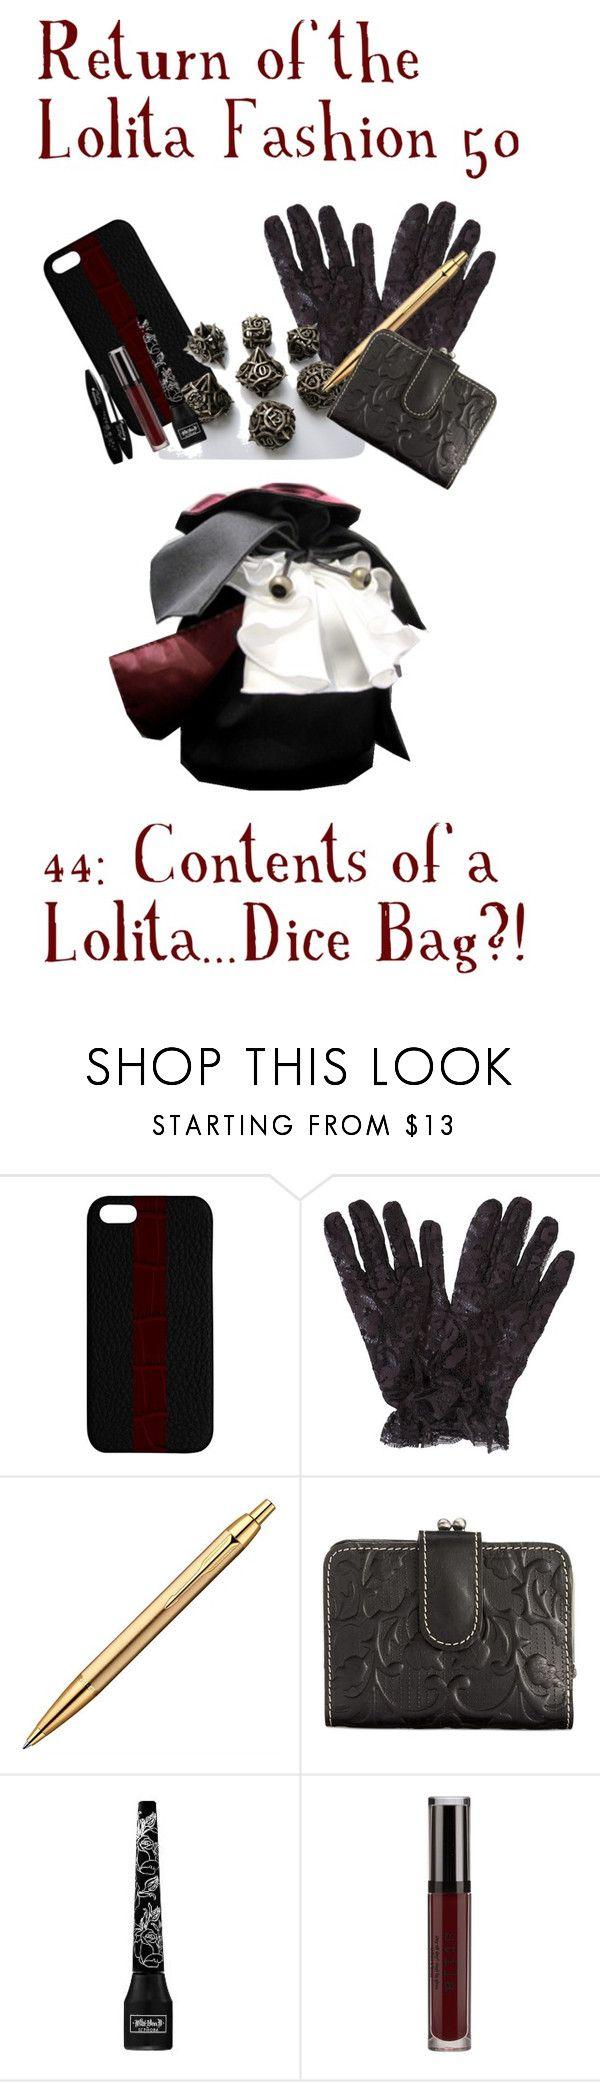 """Return of the Lolita Fashion 50 44: Contents of a Lolita ""Purse"""" by sakuuya ❤ liked on Polyvore featuring Maison Takuya, John Lewis, Patricia Nash, Kat Von D, Stila, Lancôme, gothic, gothiclolita, lolita and atelierboz"